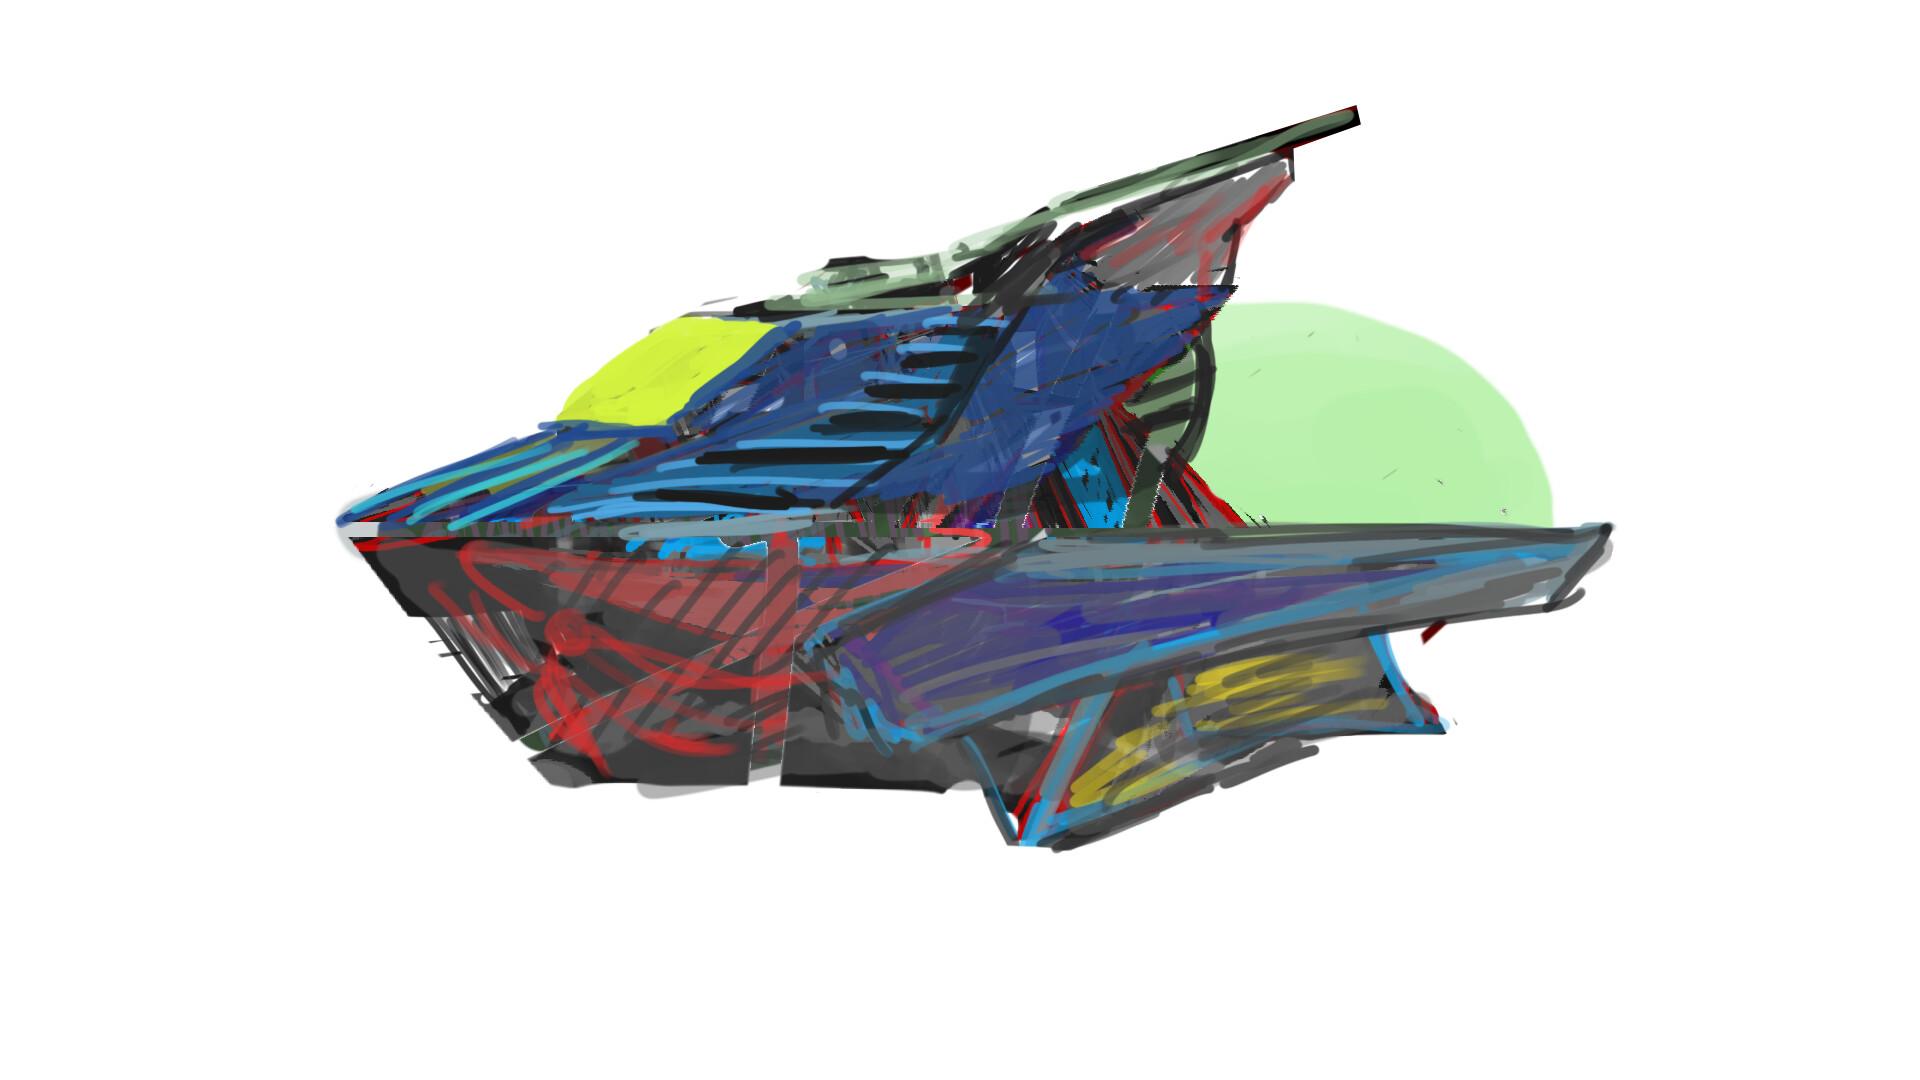 Alexander laheij ship sketch 02